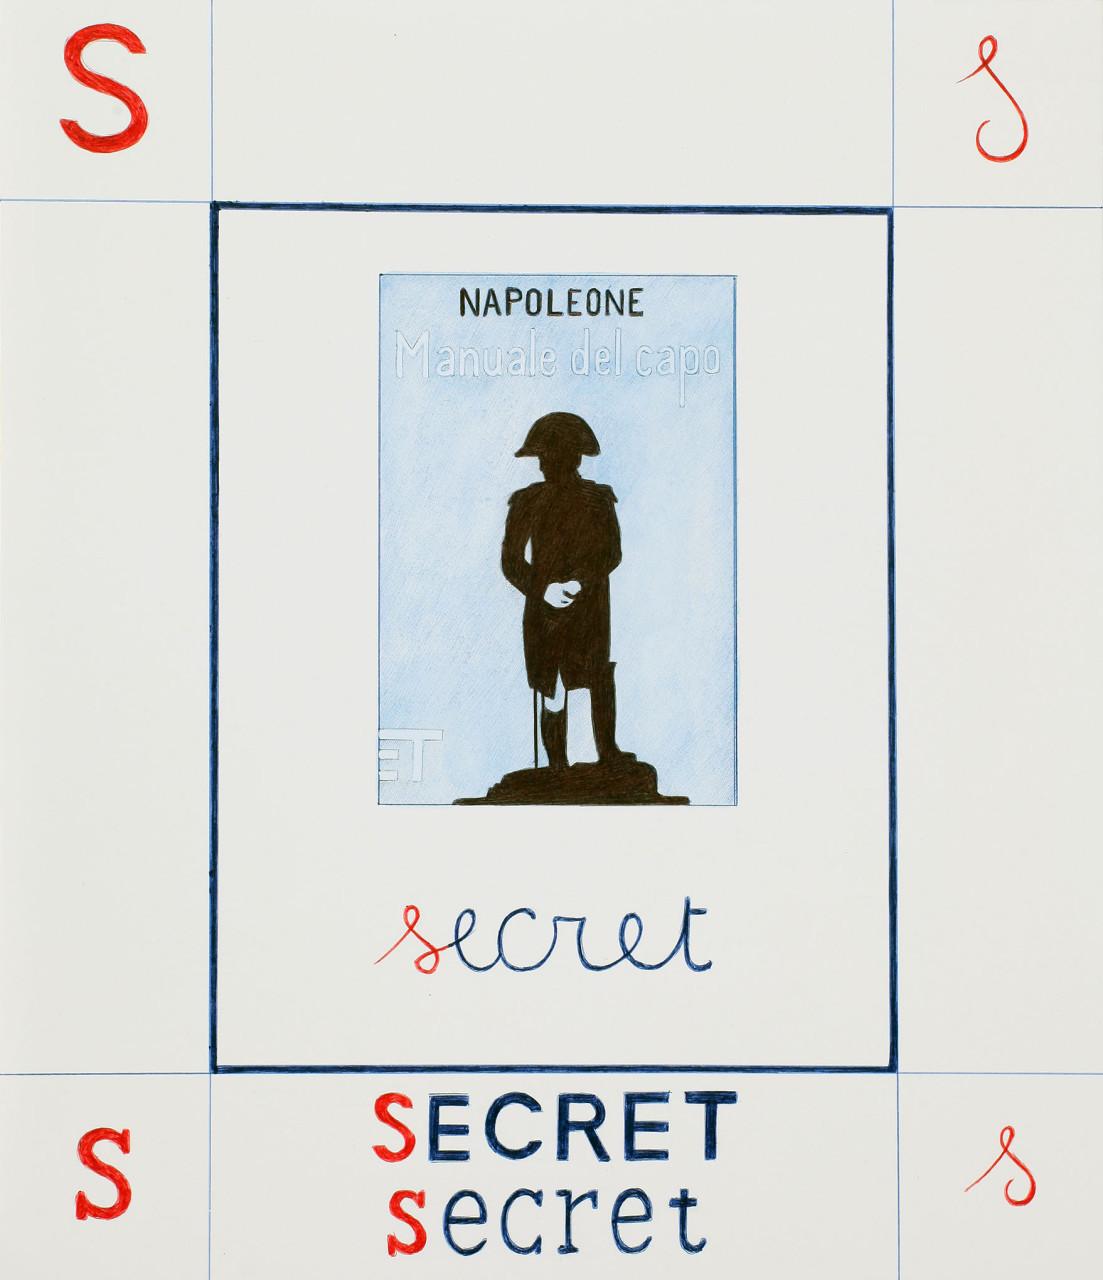 08S-secret_bassa